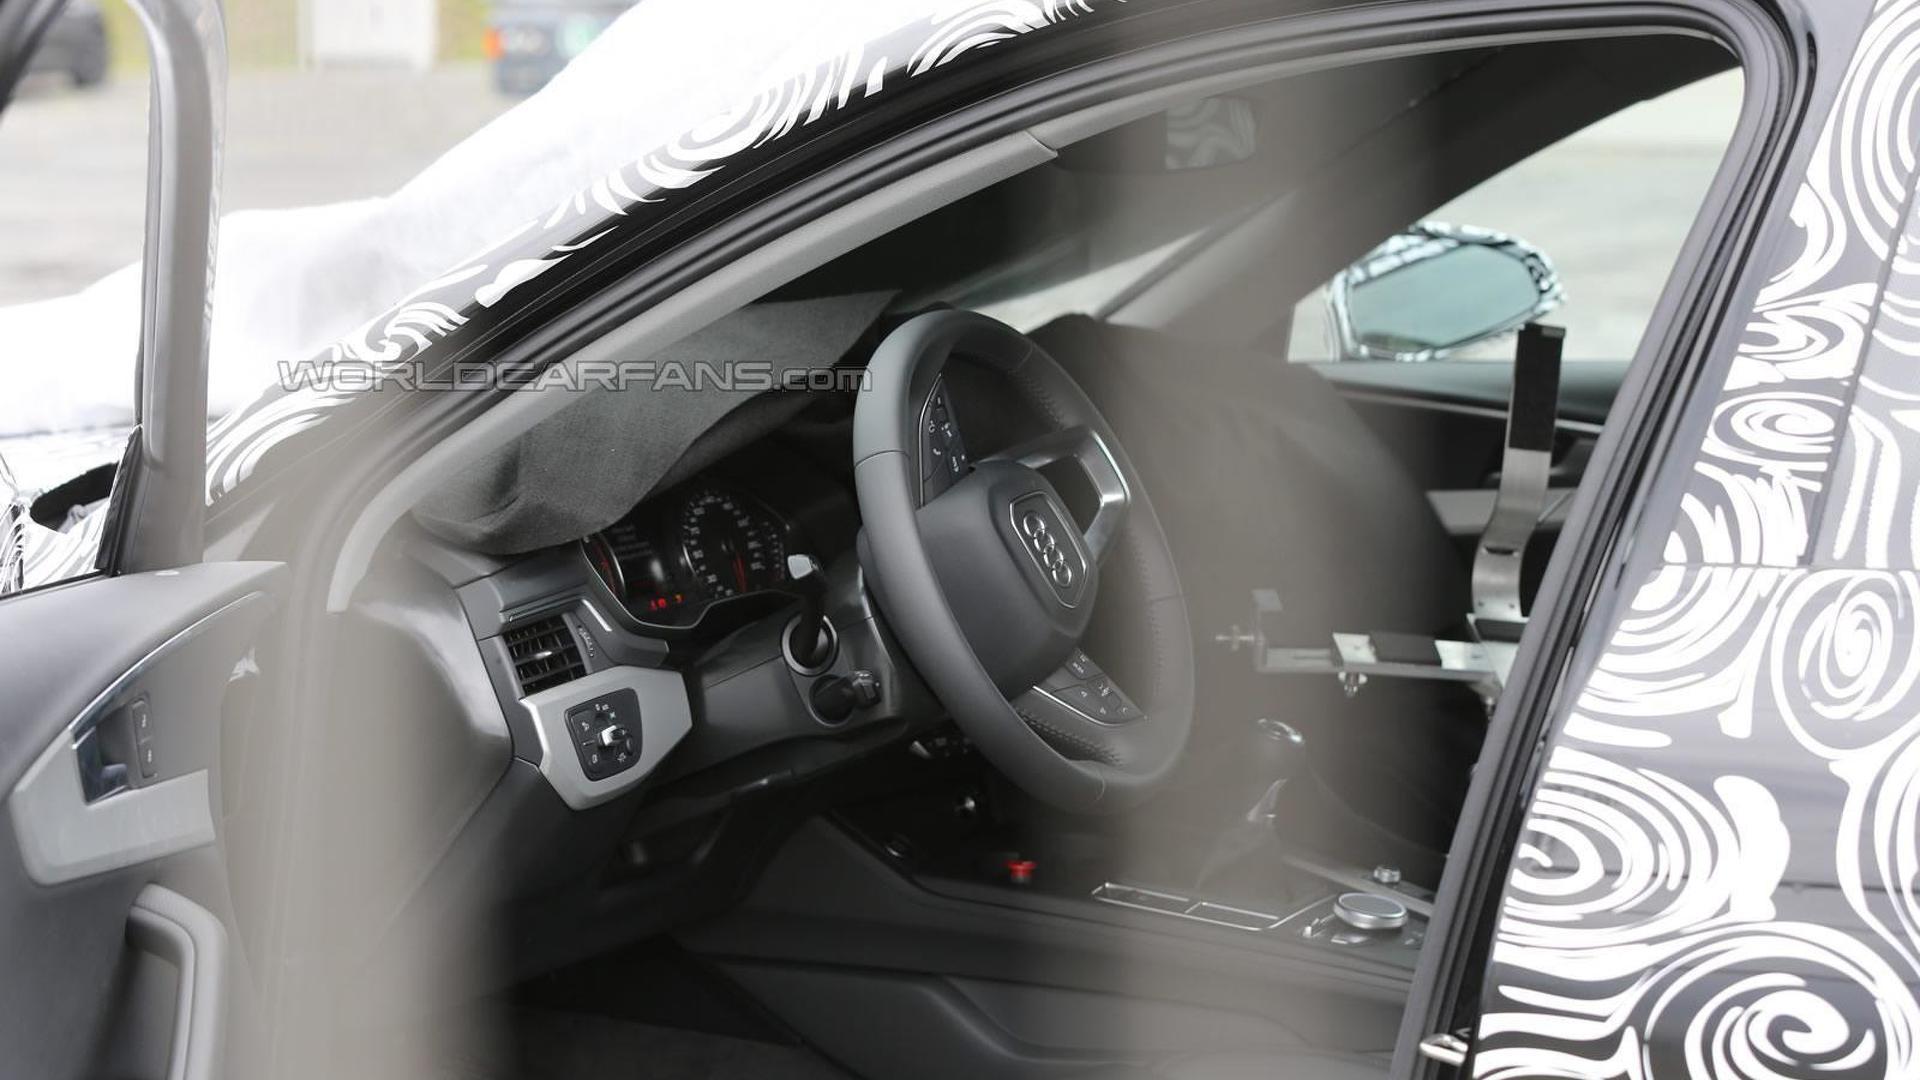 2016 Audi S4 Avant interior partially revealed in latest spy shots